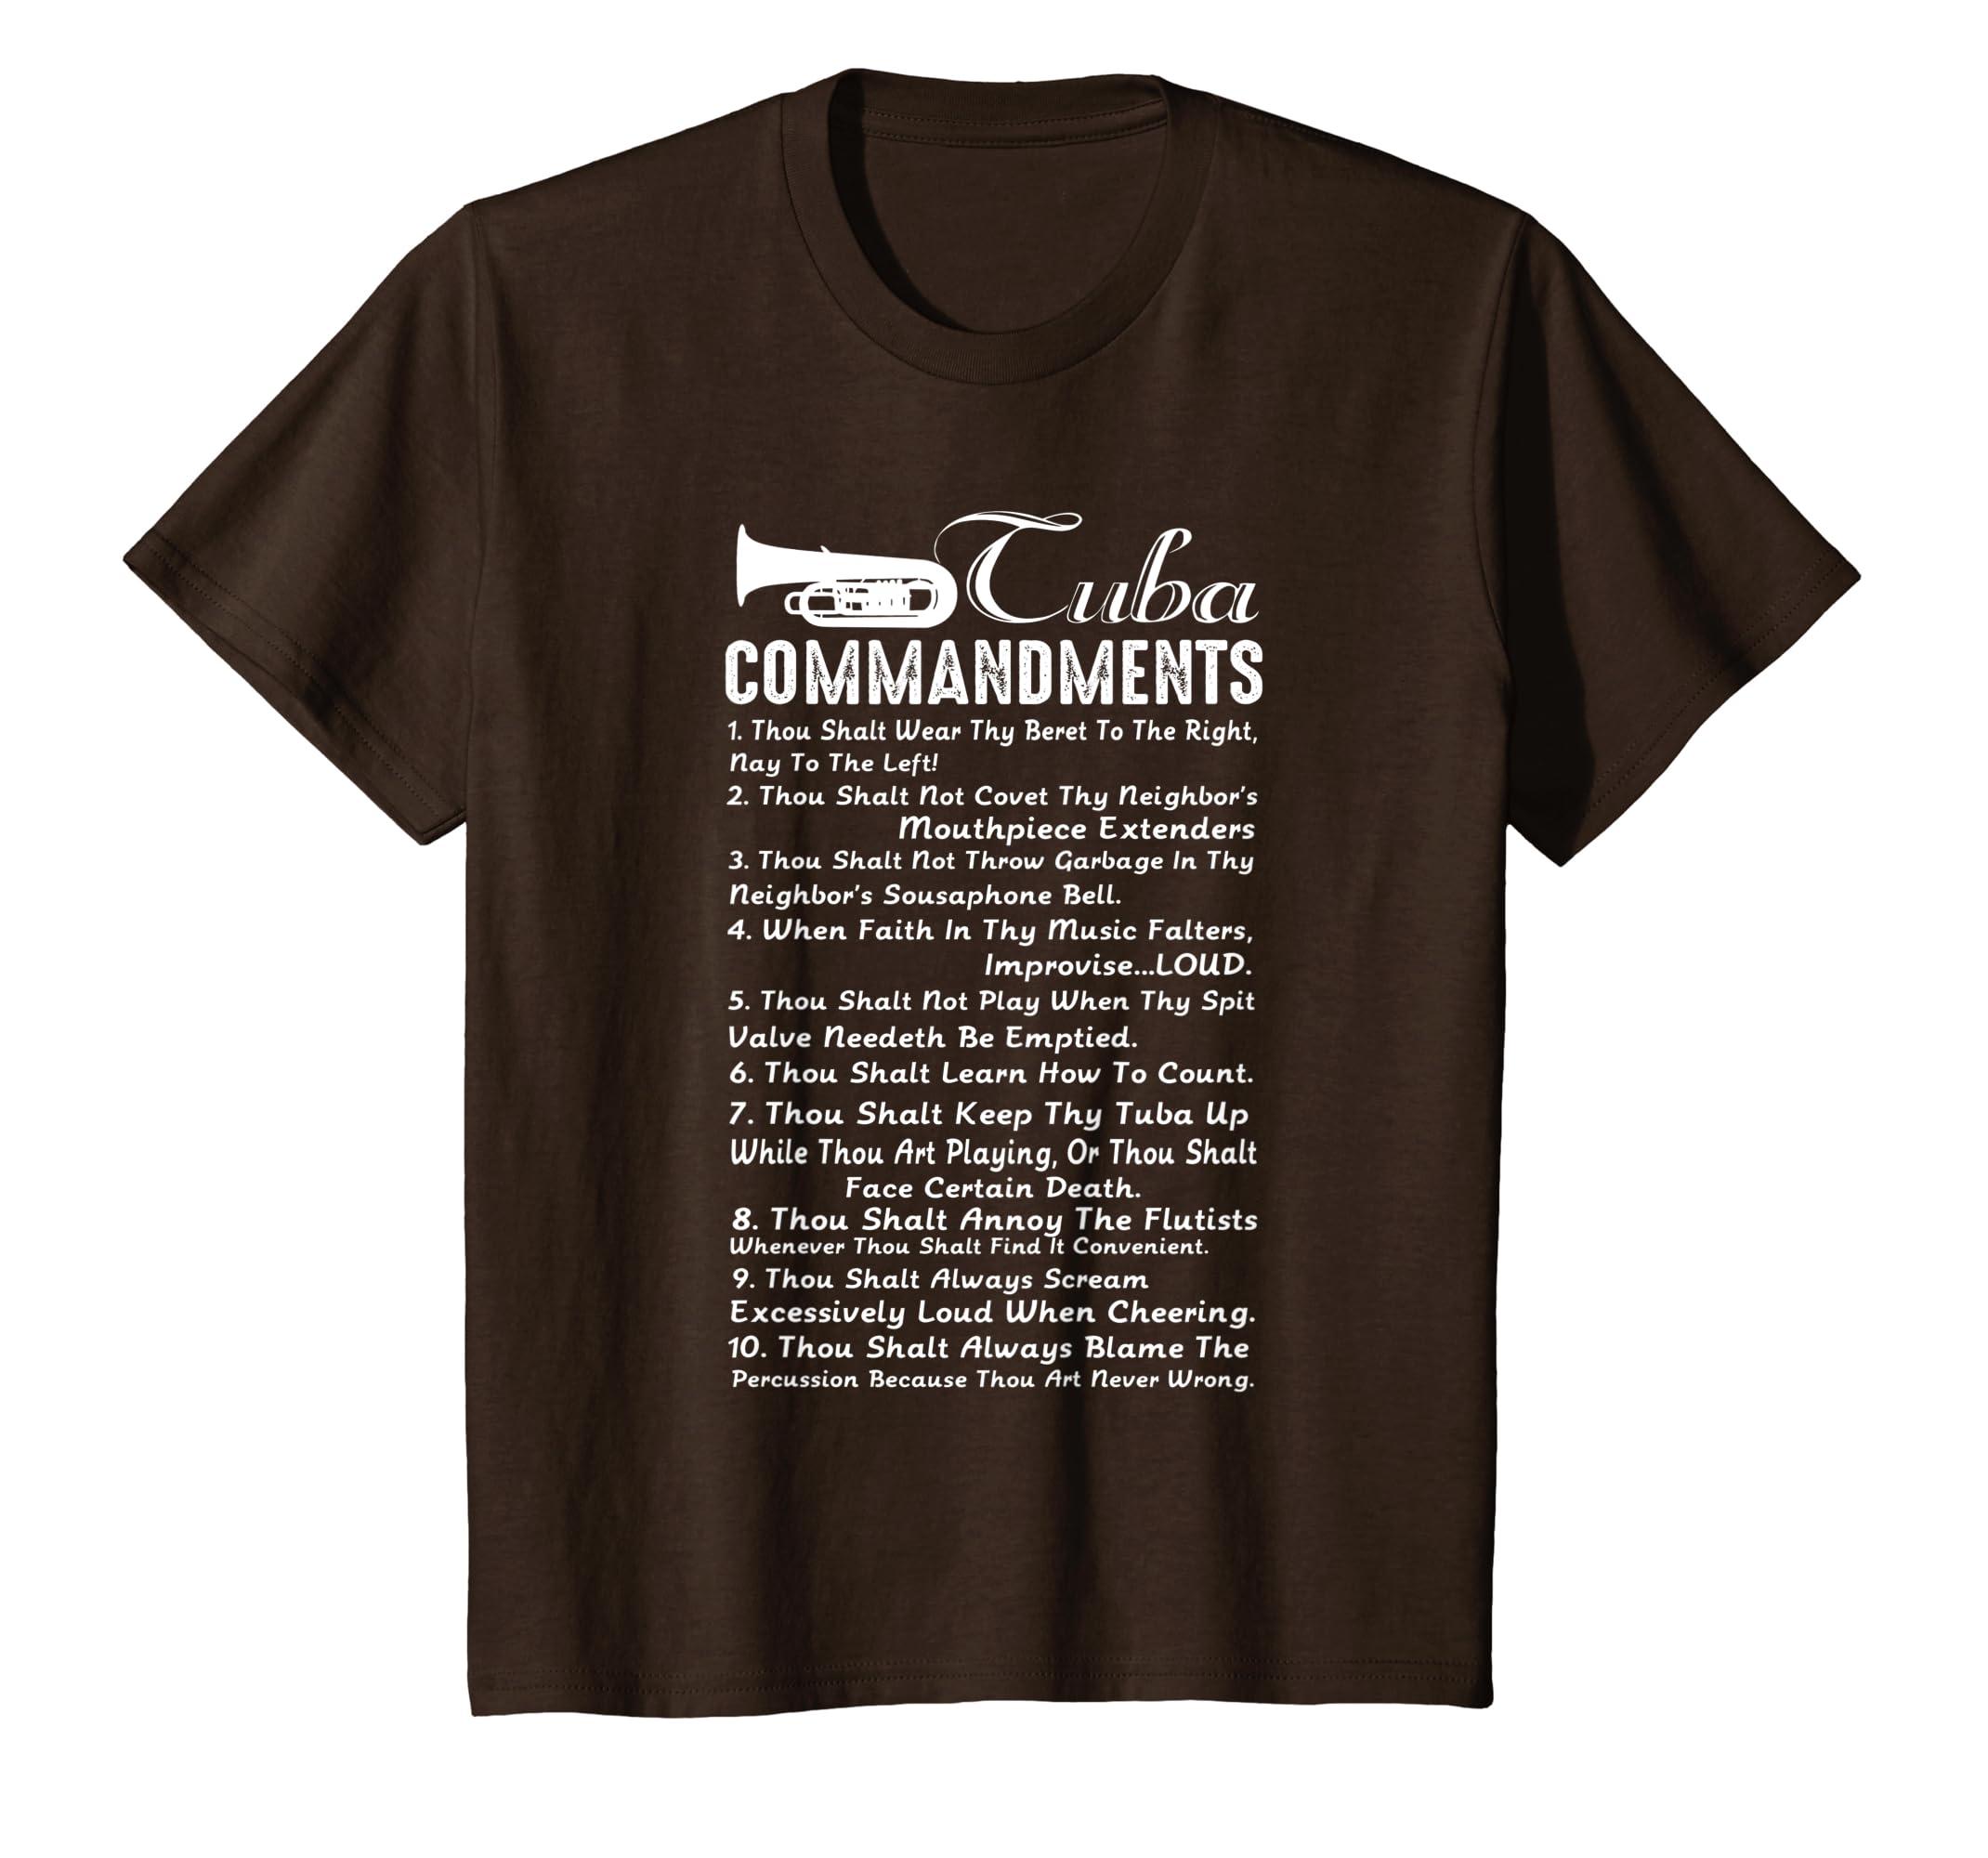 264381309 Amazon.com: Tuba Shirt - Tuba Commandment T-shirt: Clothing